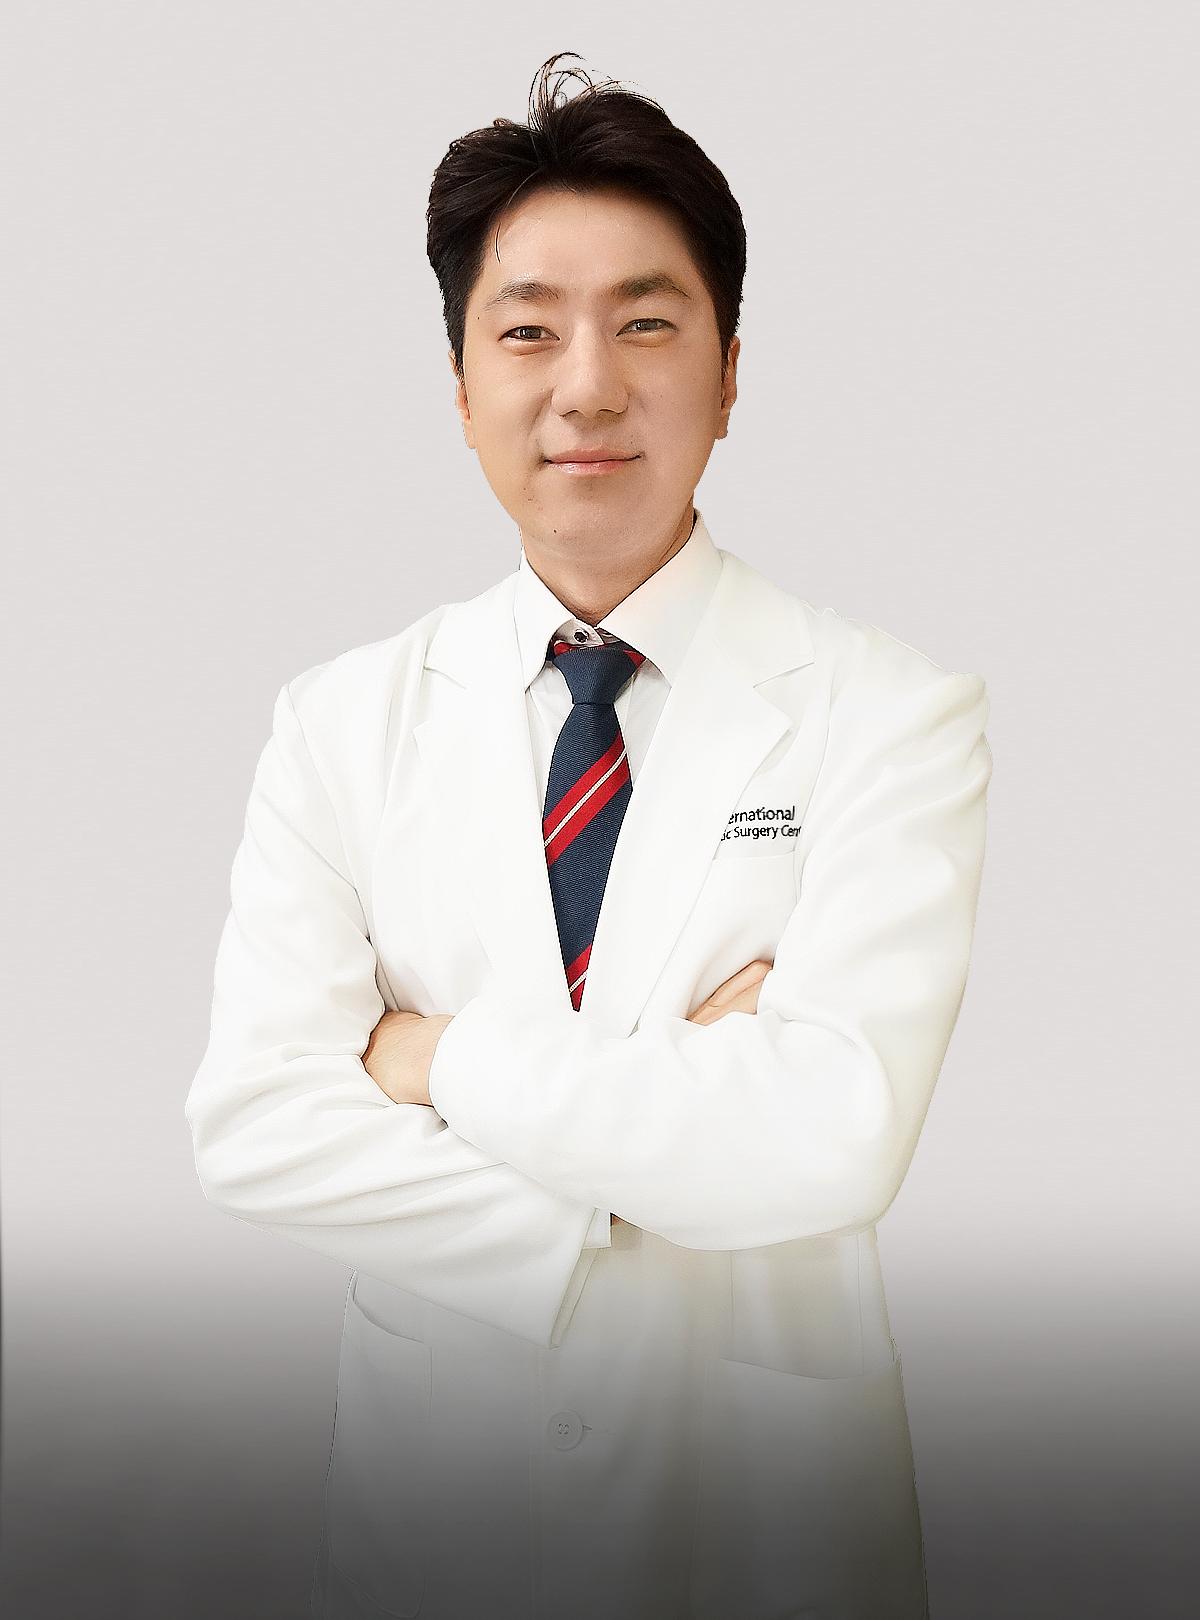 Dr. Jung Dong-Woo